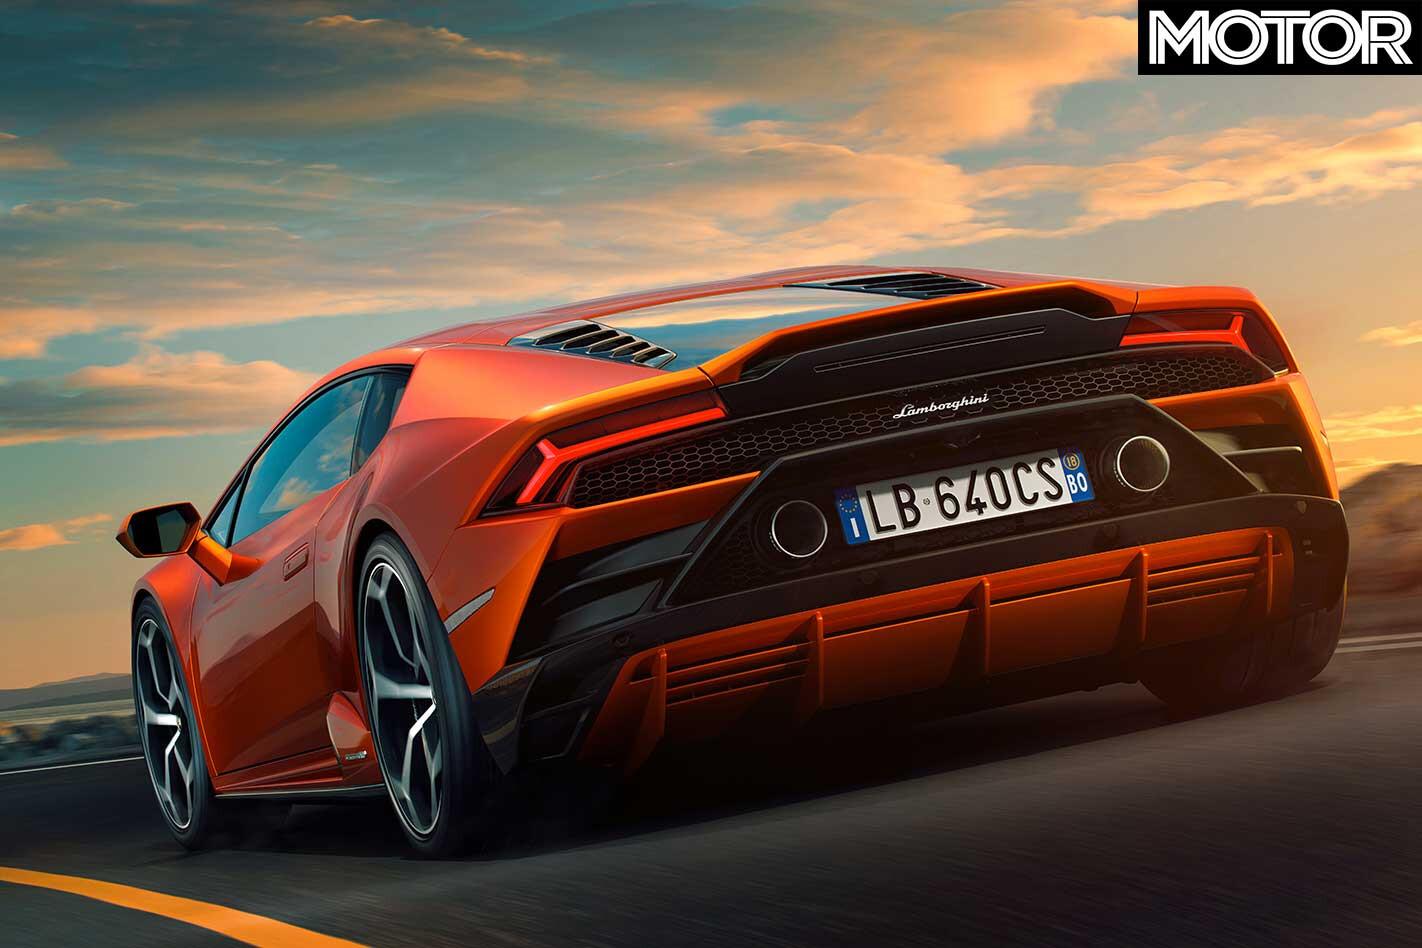 2019 Lamborghini Huracan Evo Rear Jpg